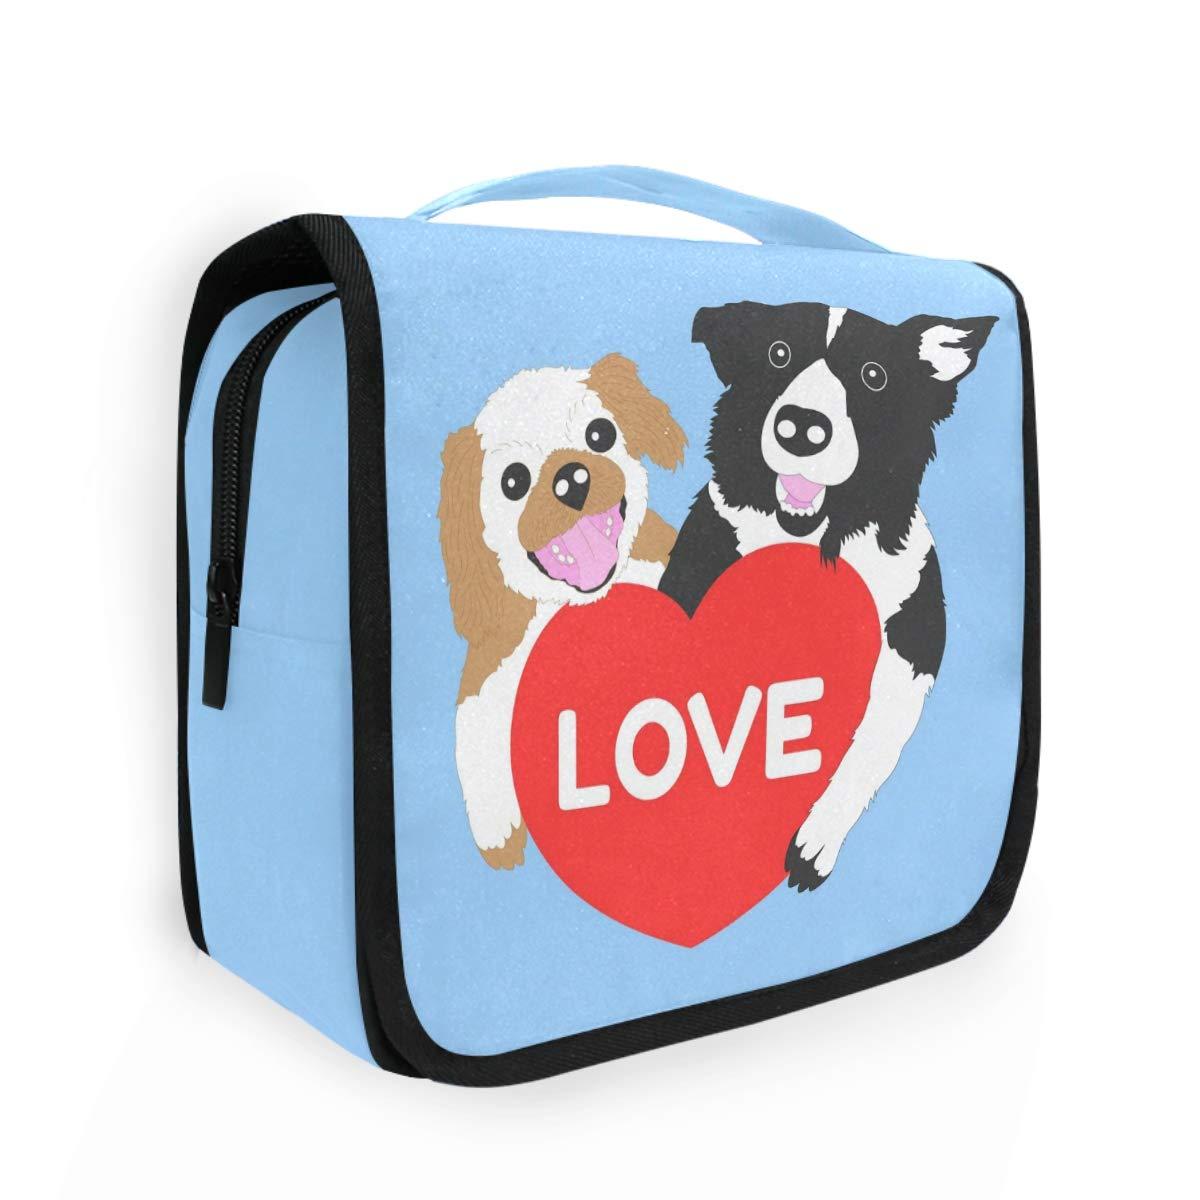 CaTaKu Happy Valentine Cosmetic Toiletry Bag, Animal Dog Love Cosmetic Bag Toiletry Bag Multifunction Bag Cosmetic Portable Makeup Waterproof Travel Hanging Organizer Bag for Men & Women